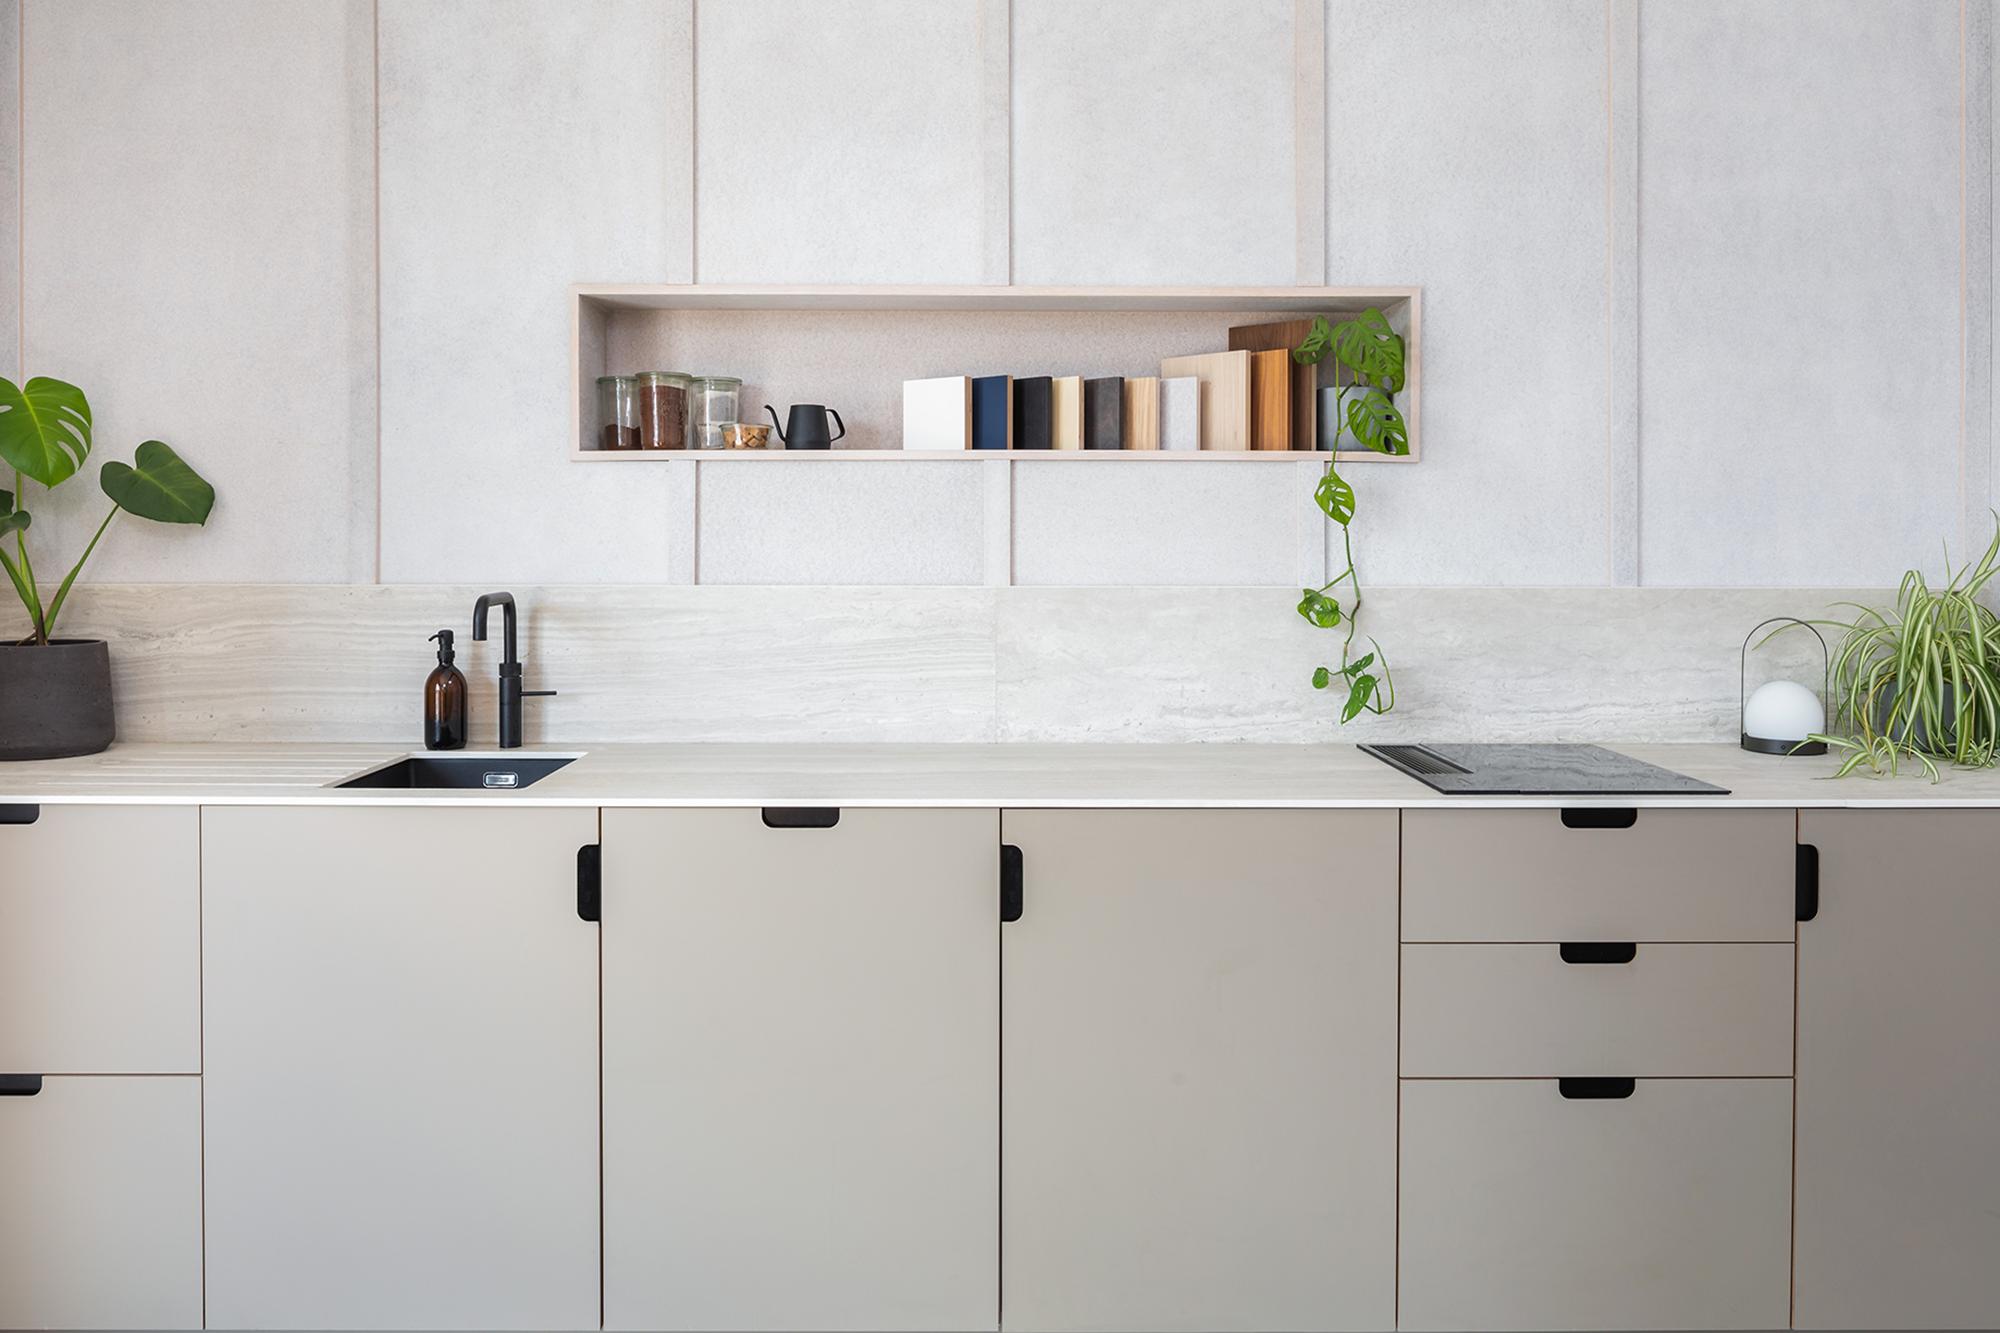 HUSK Kitchen Fronts - IKEA Replacement Fronts - HUSK Showroom - Bristol